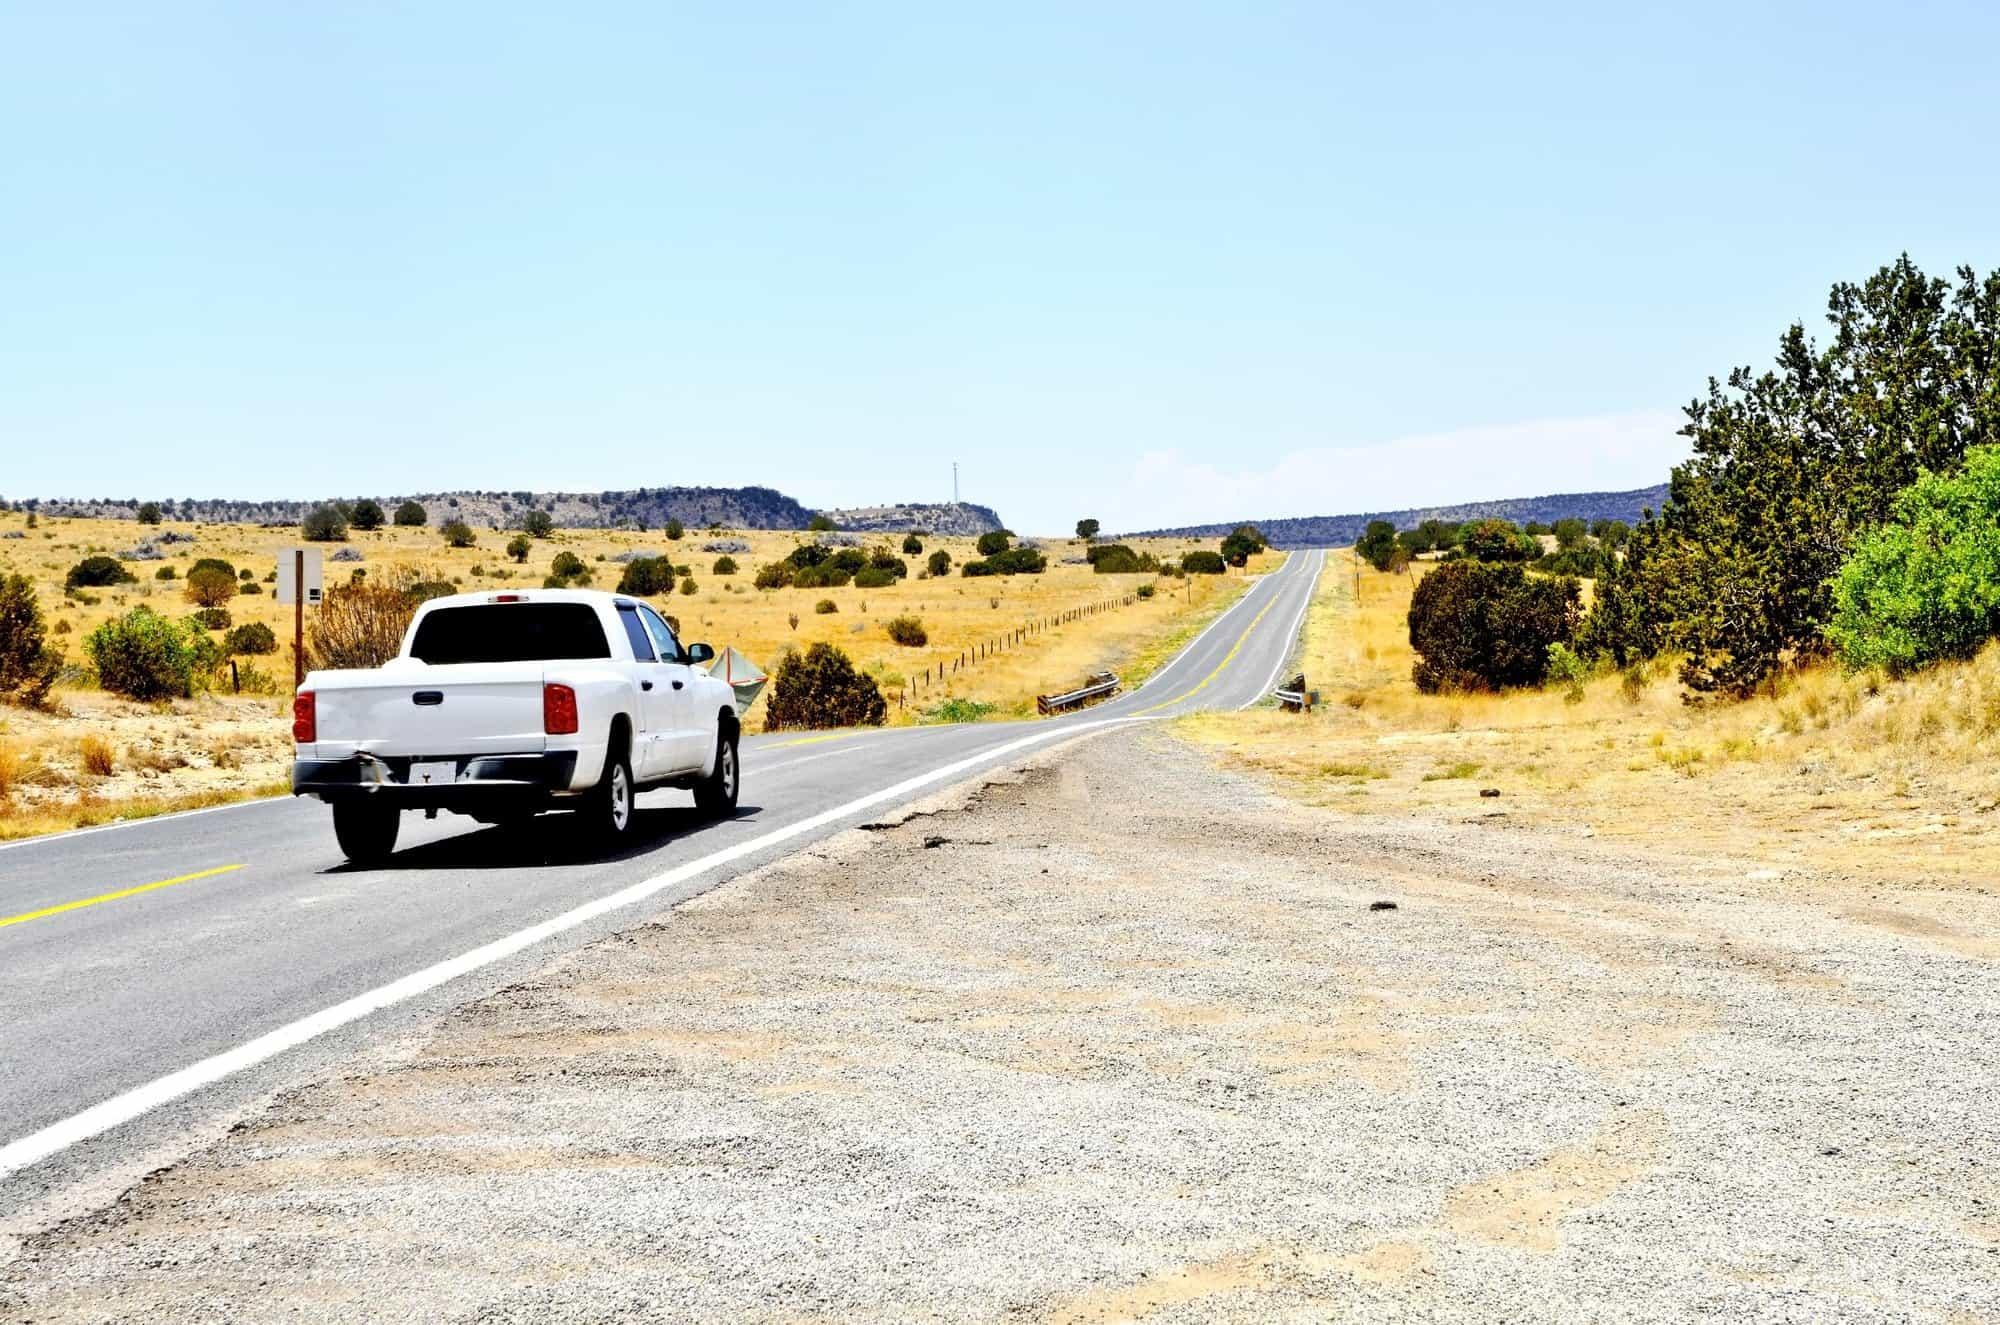 White work pickup truck driving down road